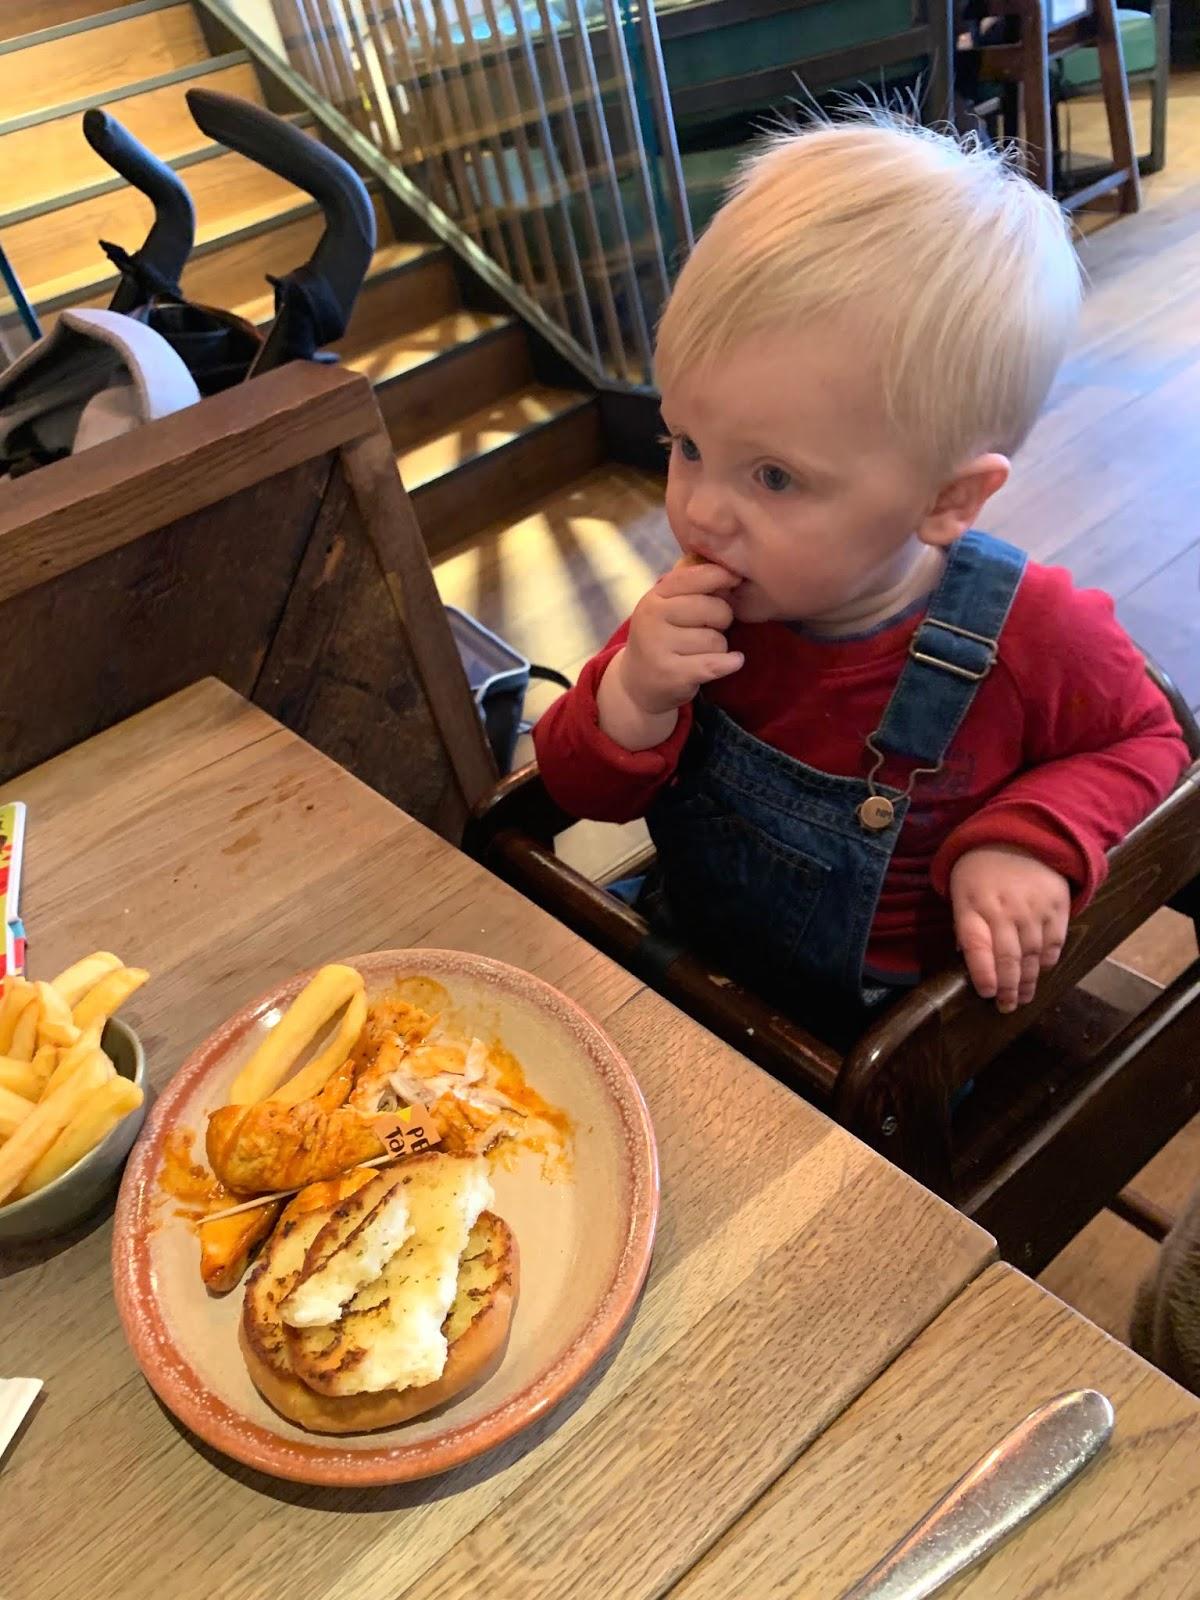 Baby reviewing Nandino's menu intu potteries